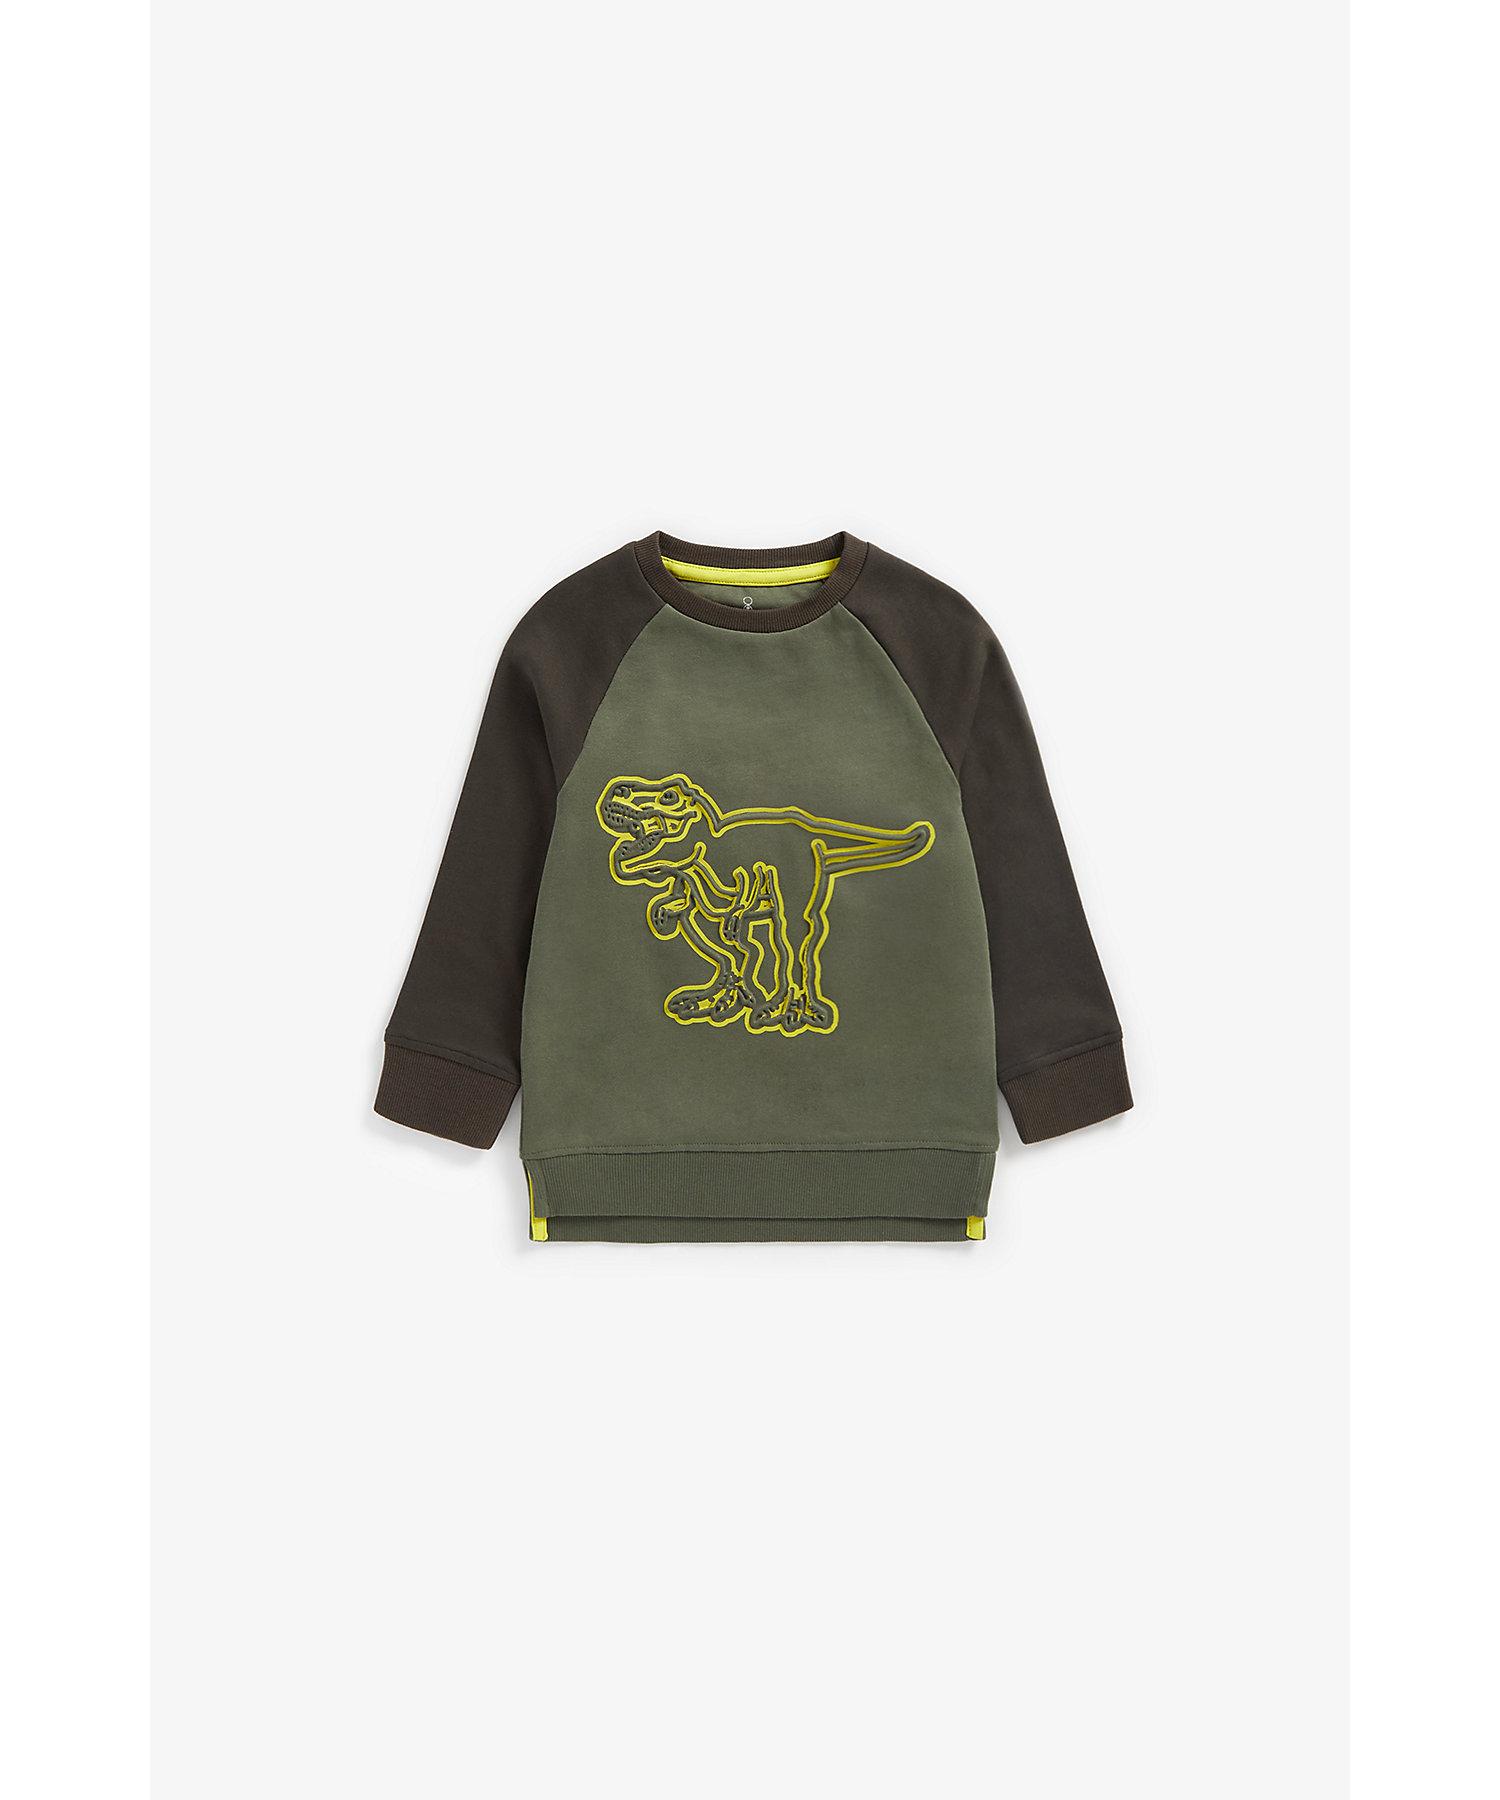 Mothercare | Boys Full Sleeves Sweatshirt Embossed Dino Design - Grey